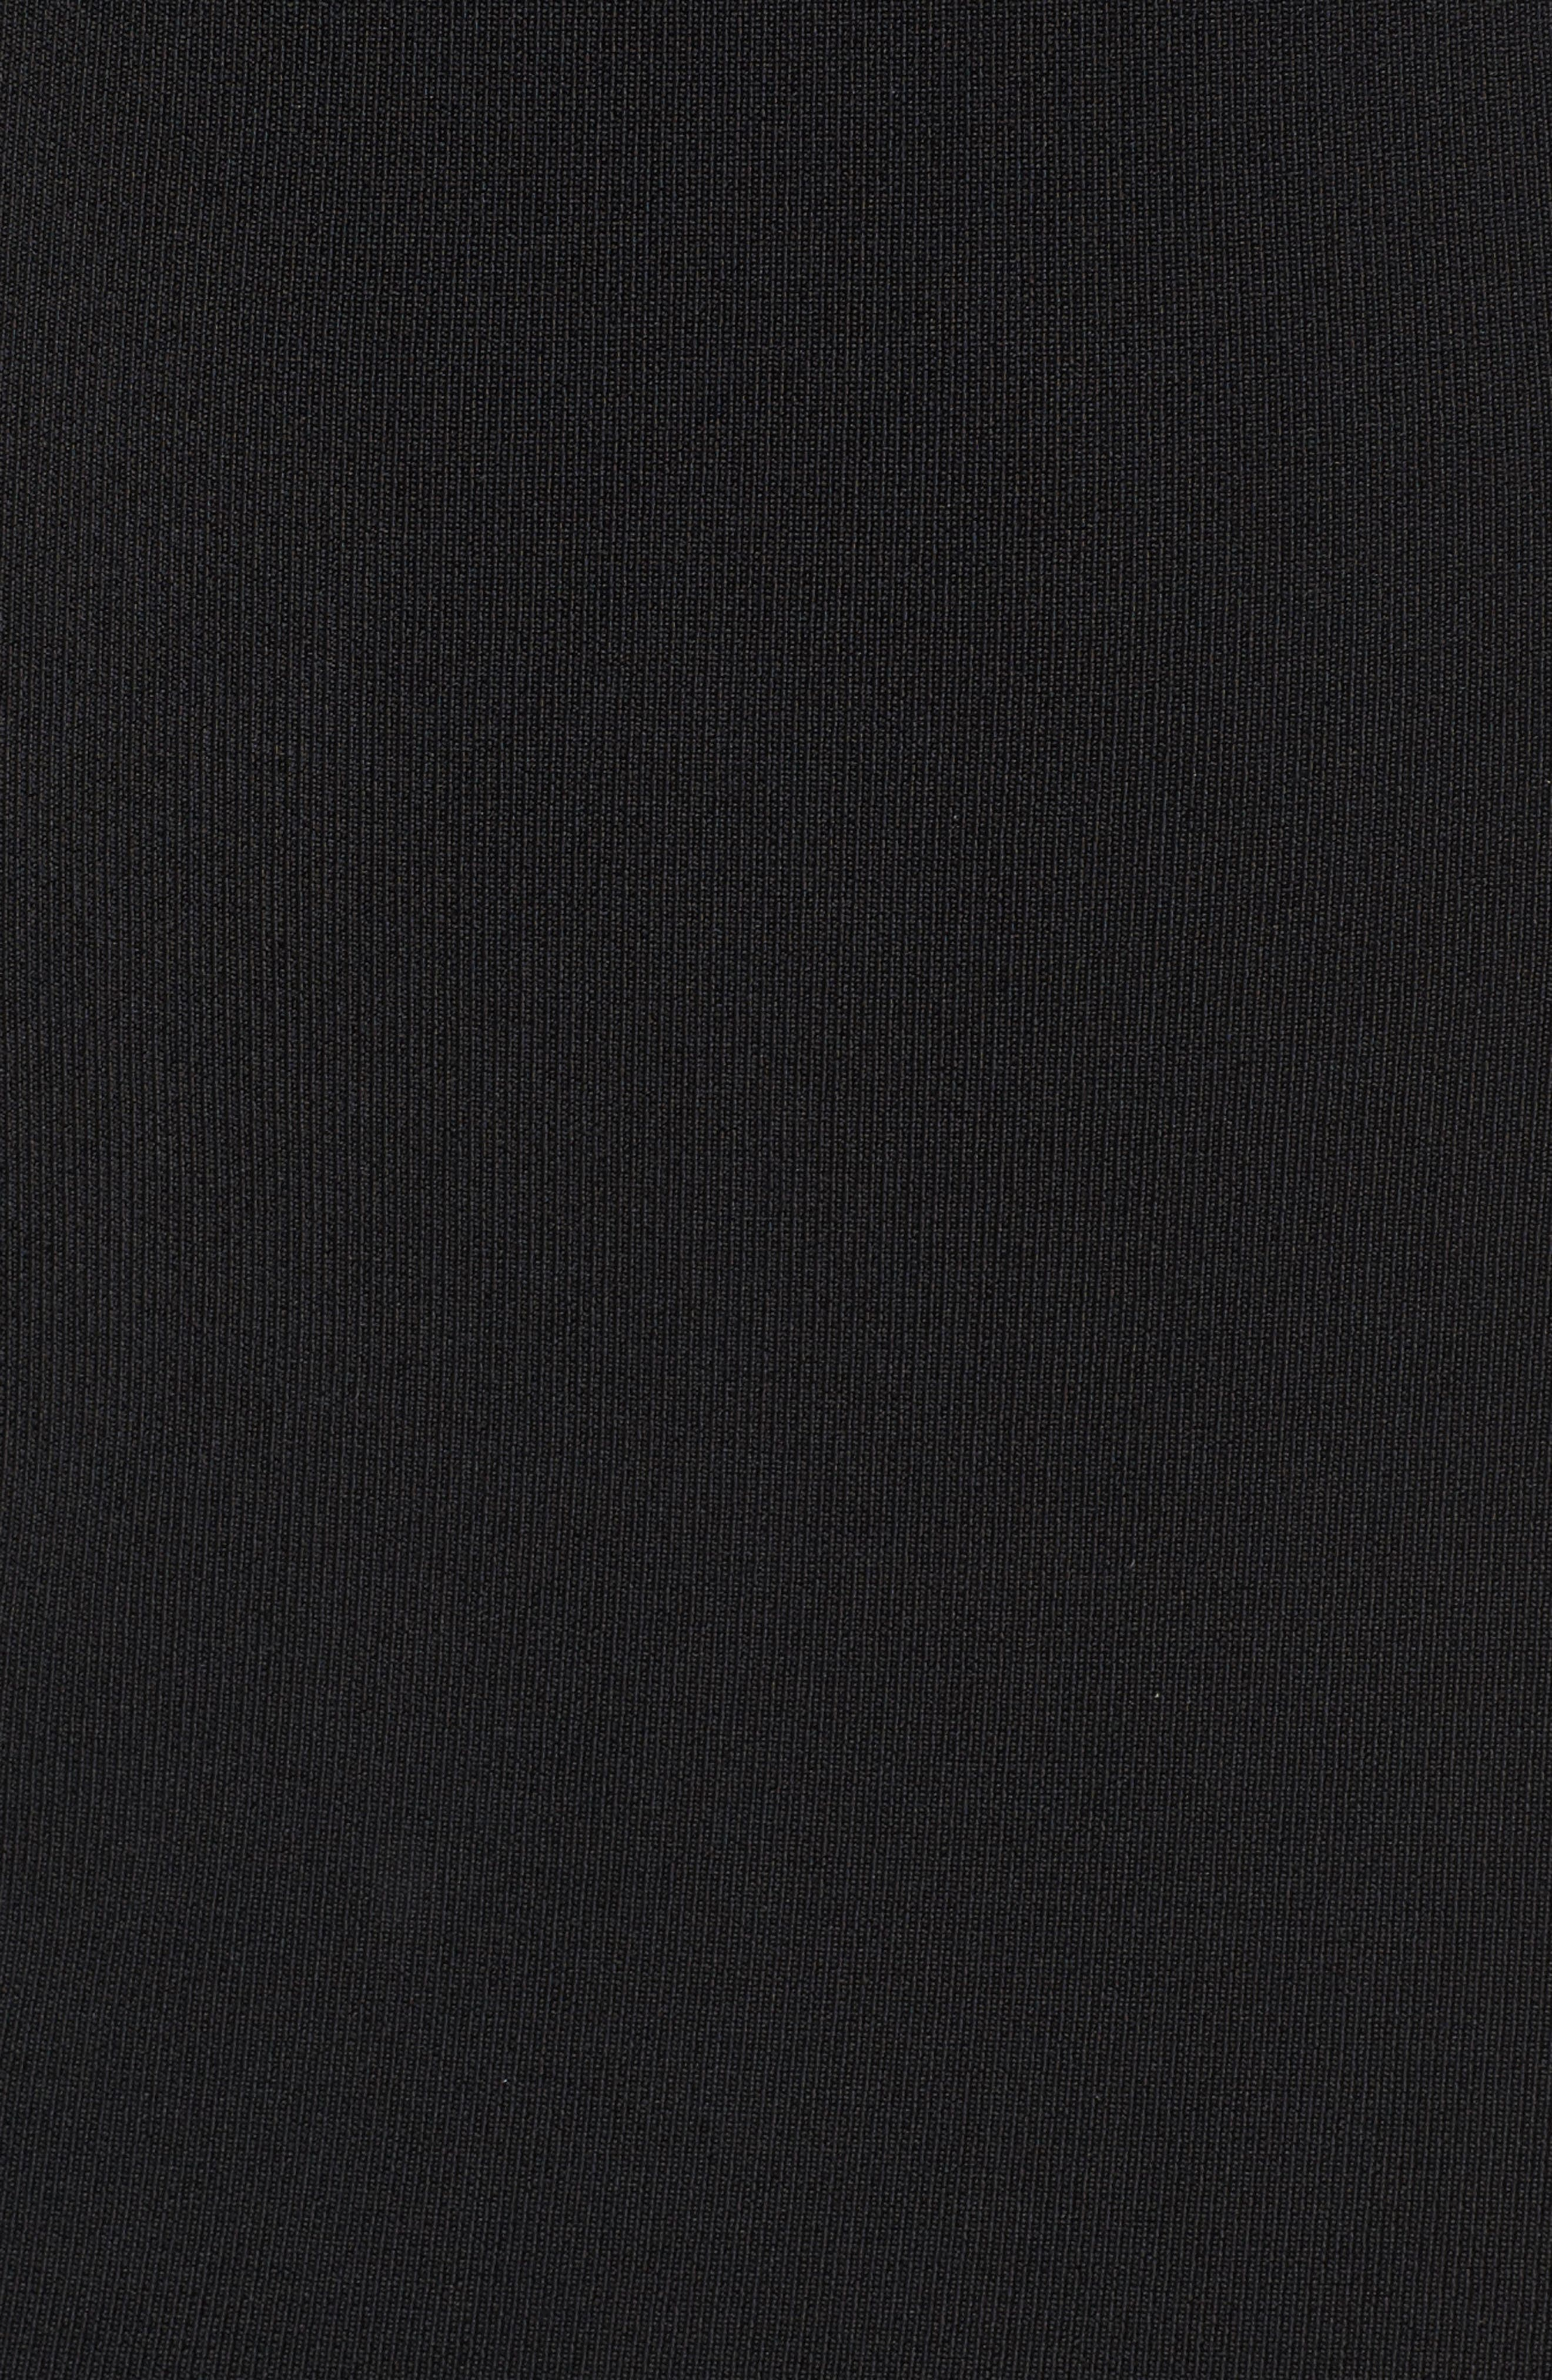 Halter Keyhole Sweater Dress,                             Alternate thumbnail 6, color,                             Black